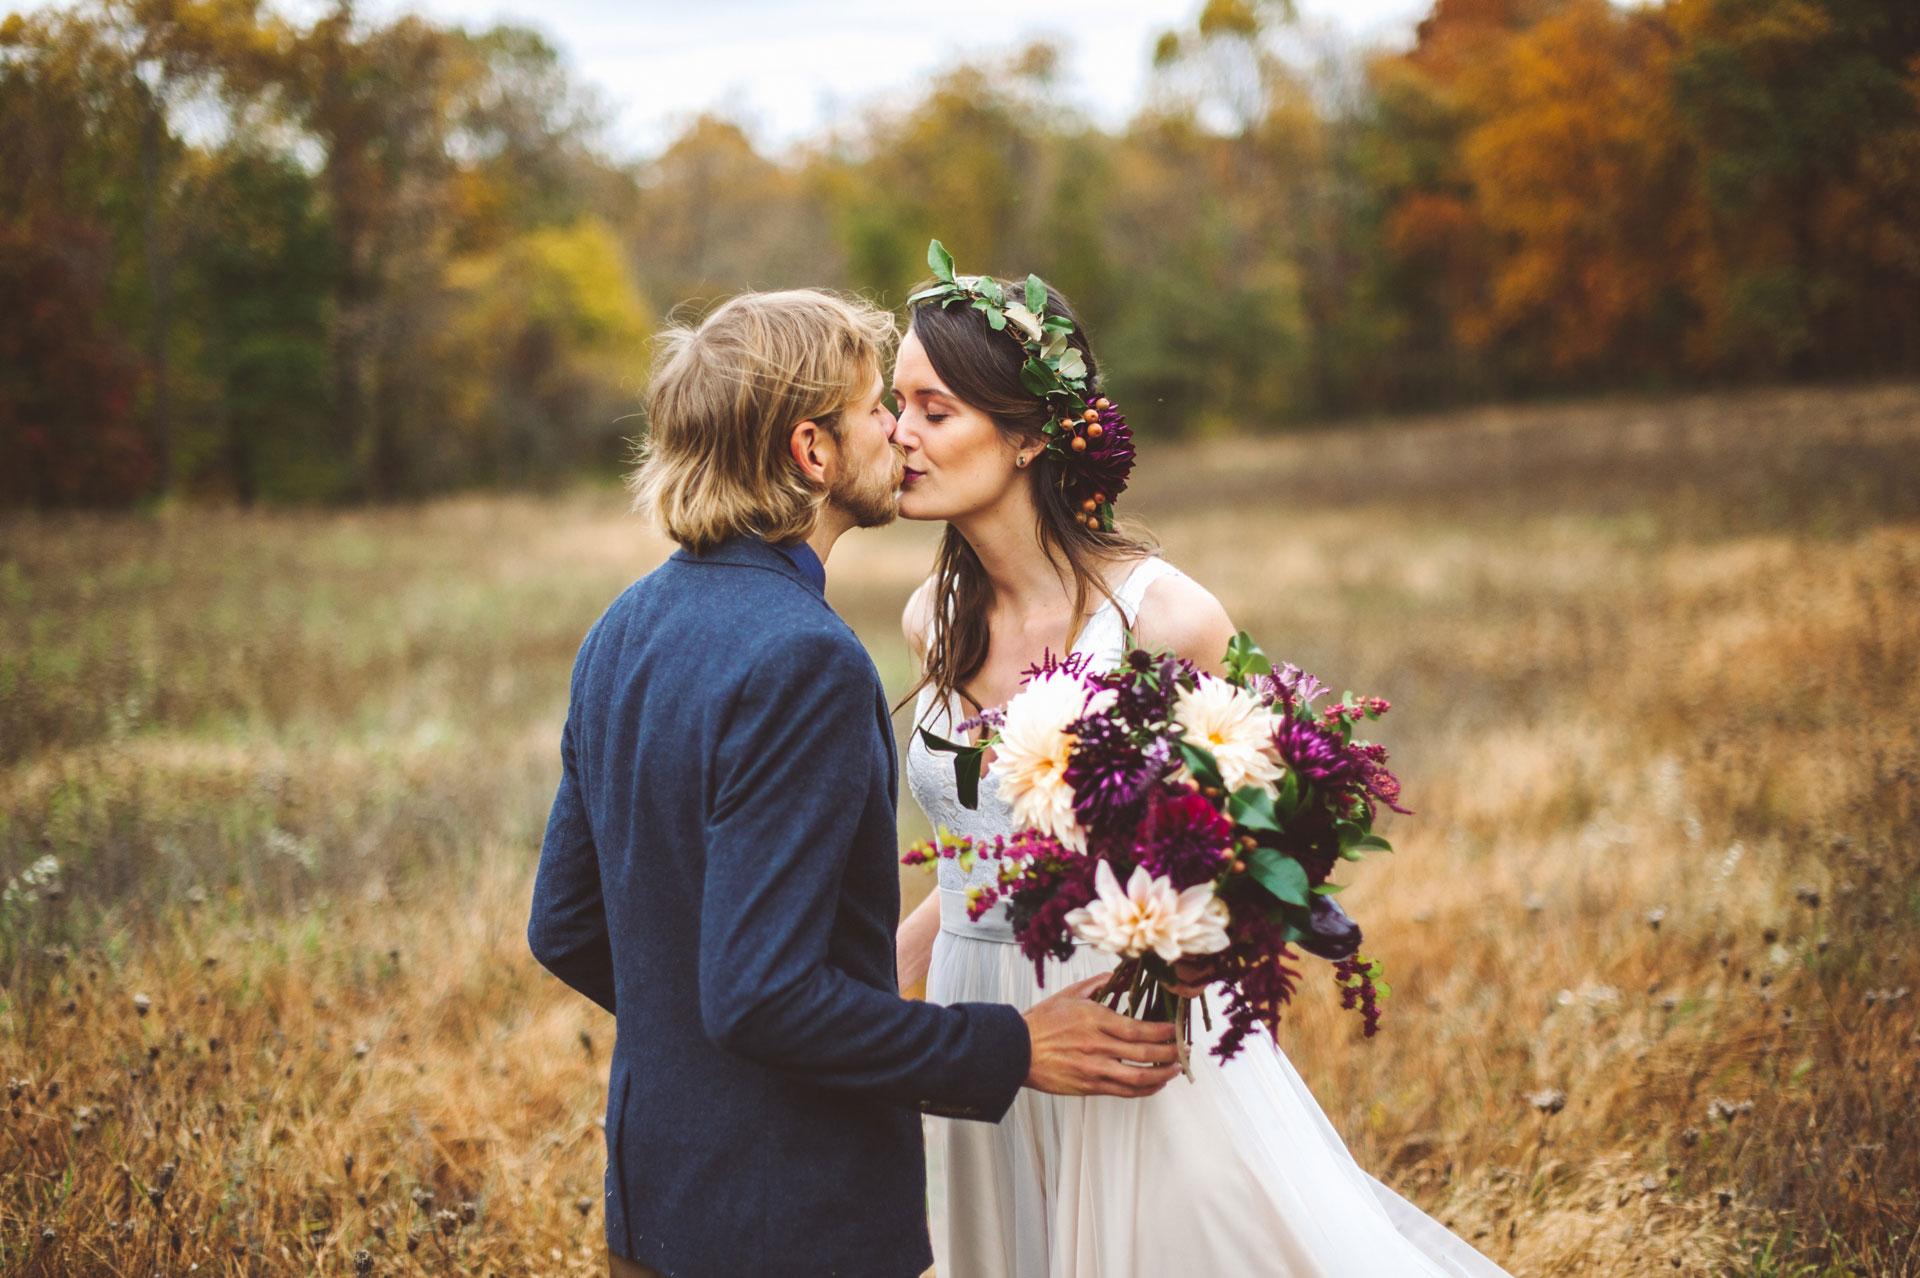 Hand in Hand Wedding, flowers by LynnVale Studios, photo by Rebekah J. Murray